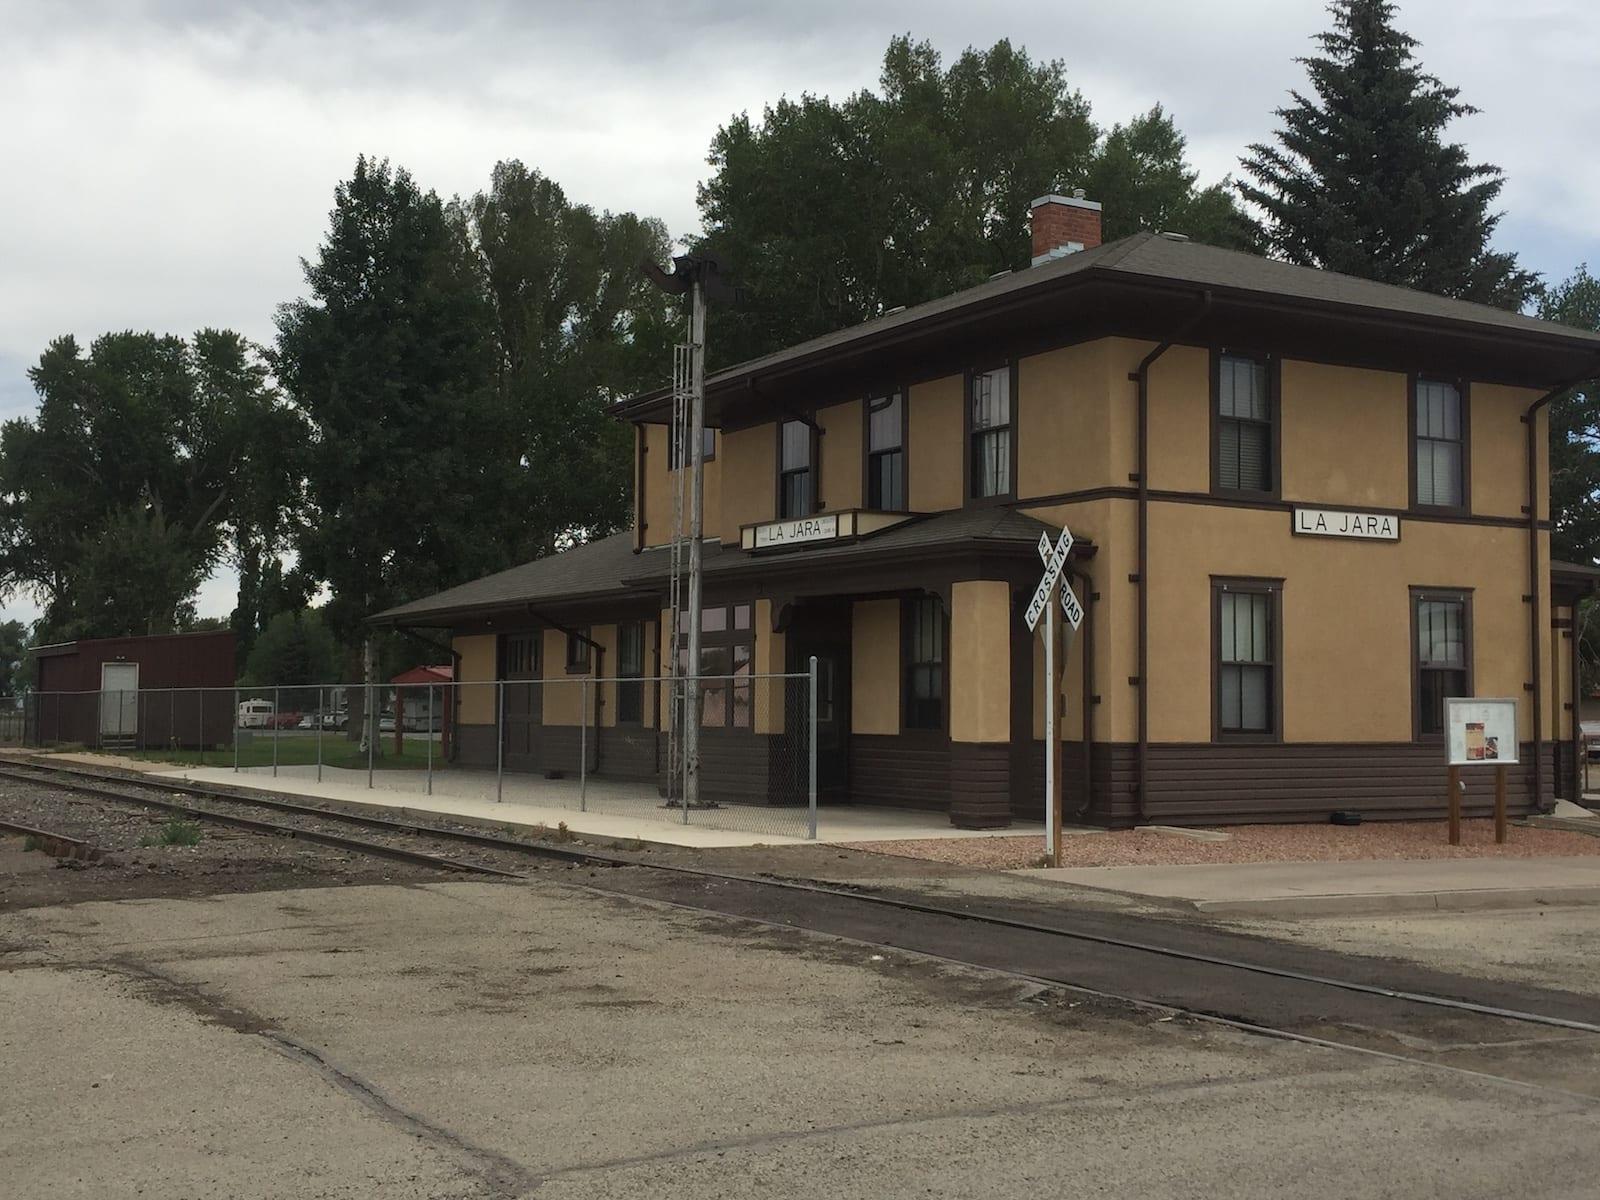 La Jara Colorado Train Depot Railroad Tracks